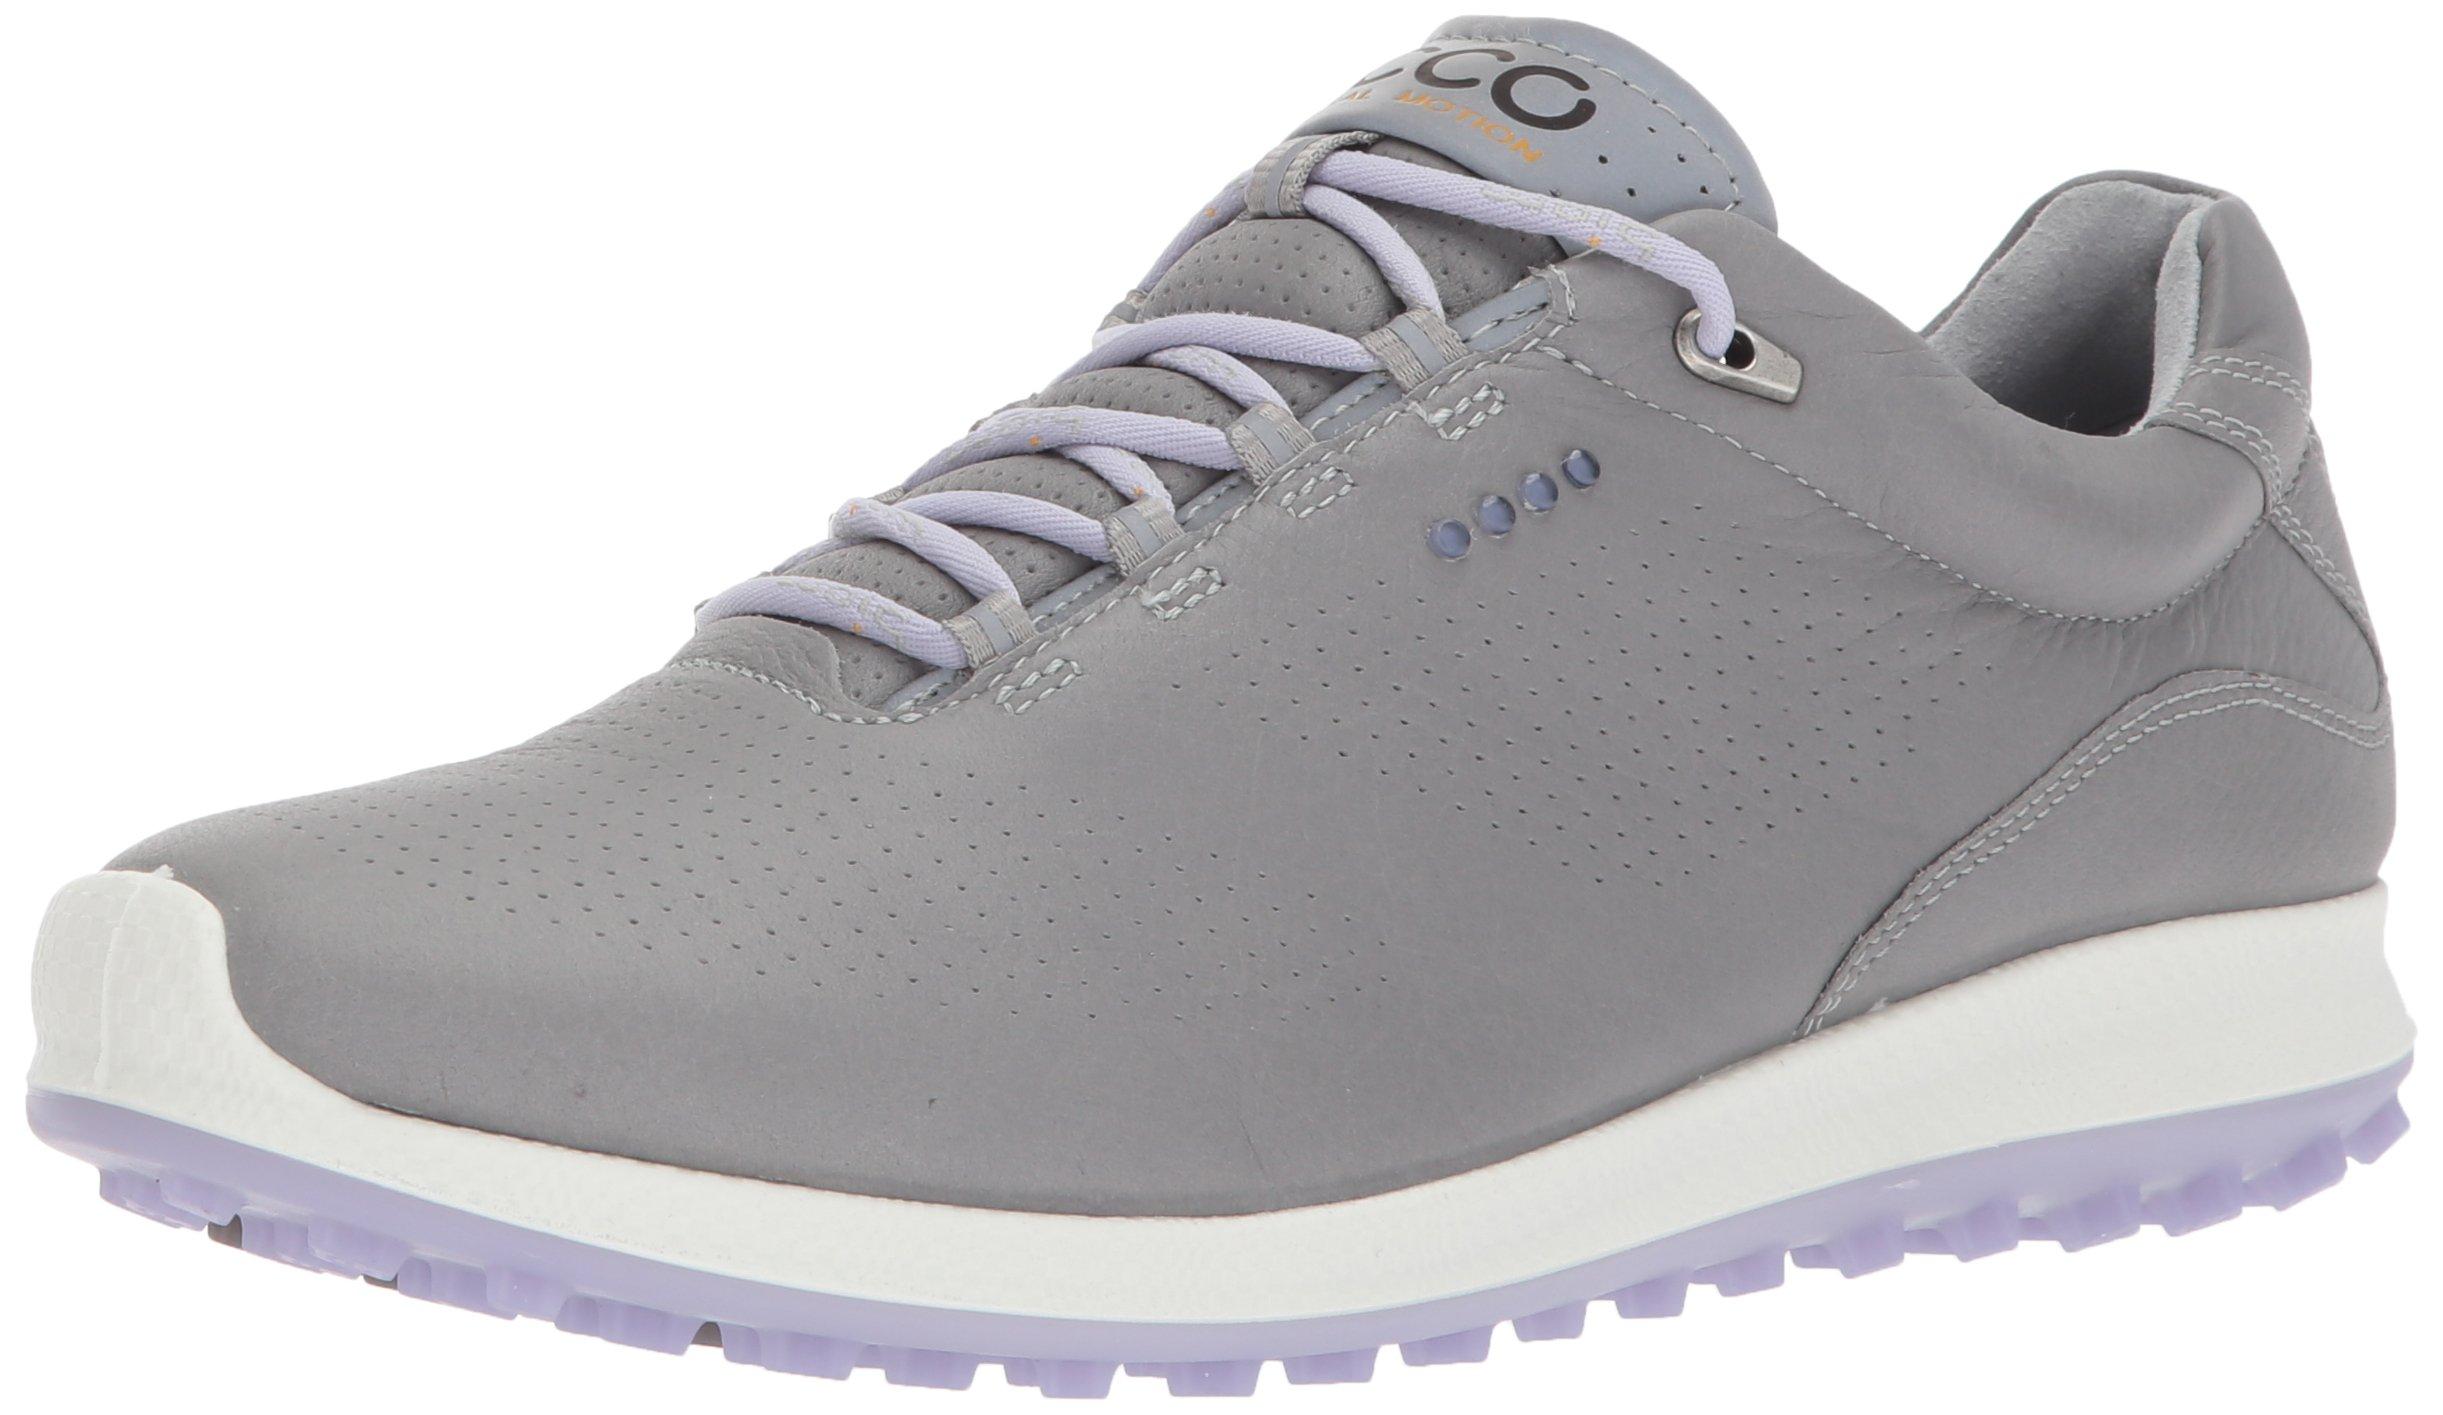 ECCO Women's Biom Hybrid 2 Perforated Golf Shoe, Wild Dove/Crocus, 37 EU/6-6.5 B(M) US